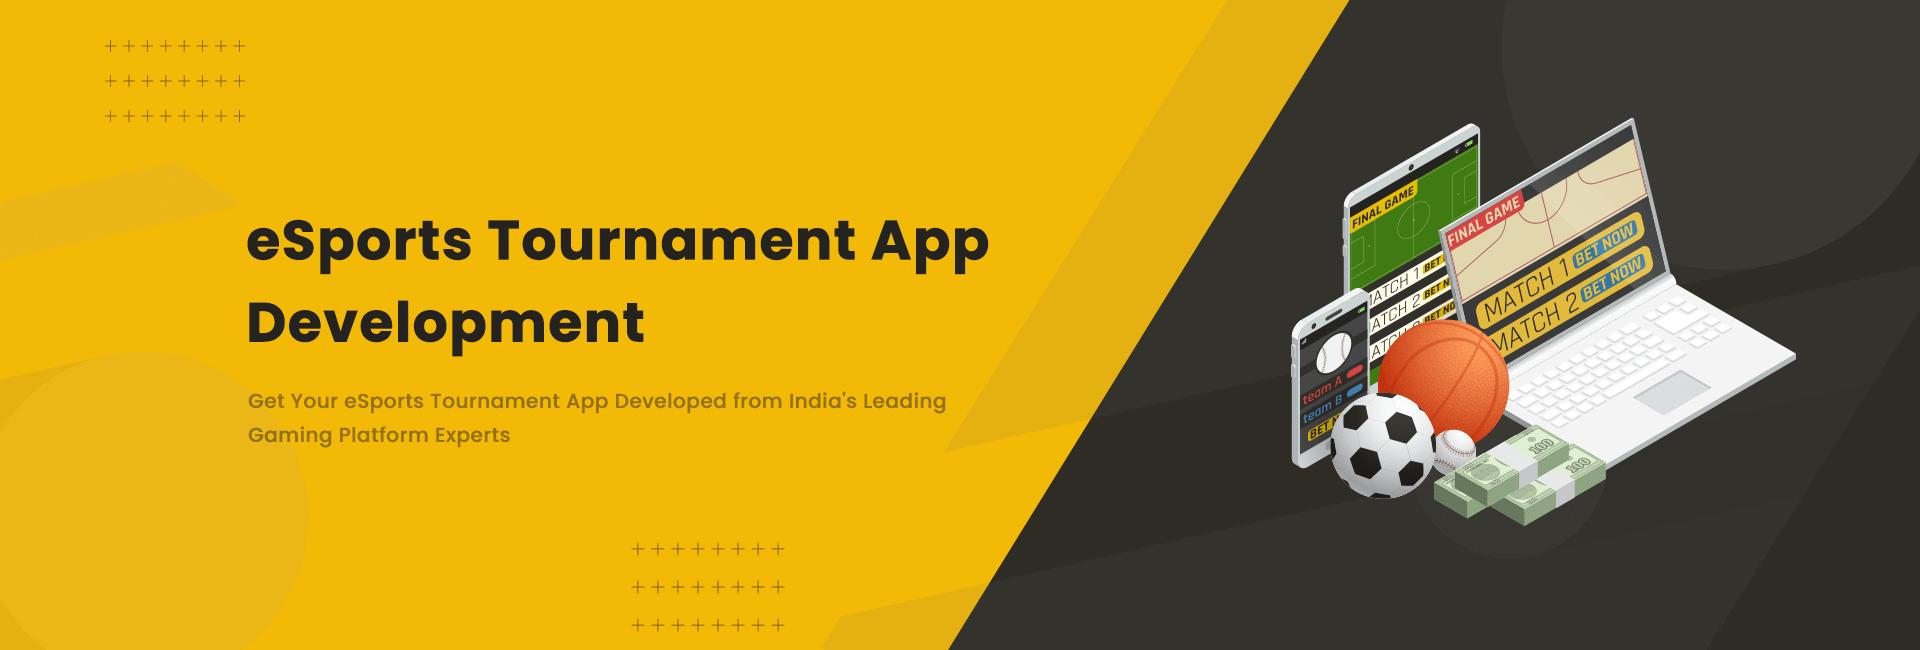 Esports Tournament App Development